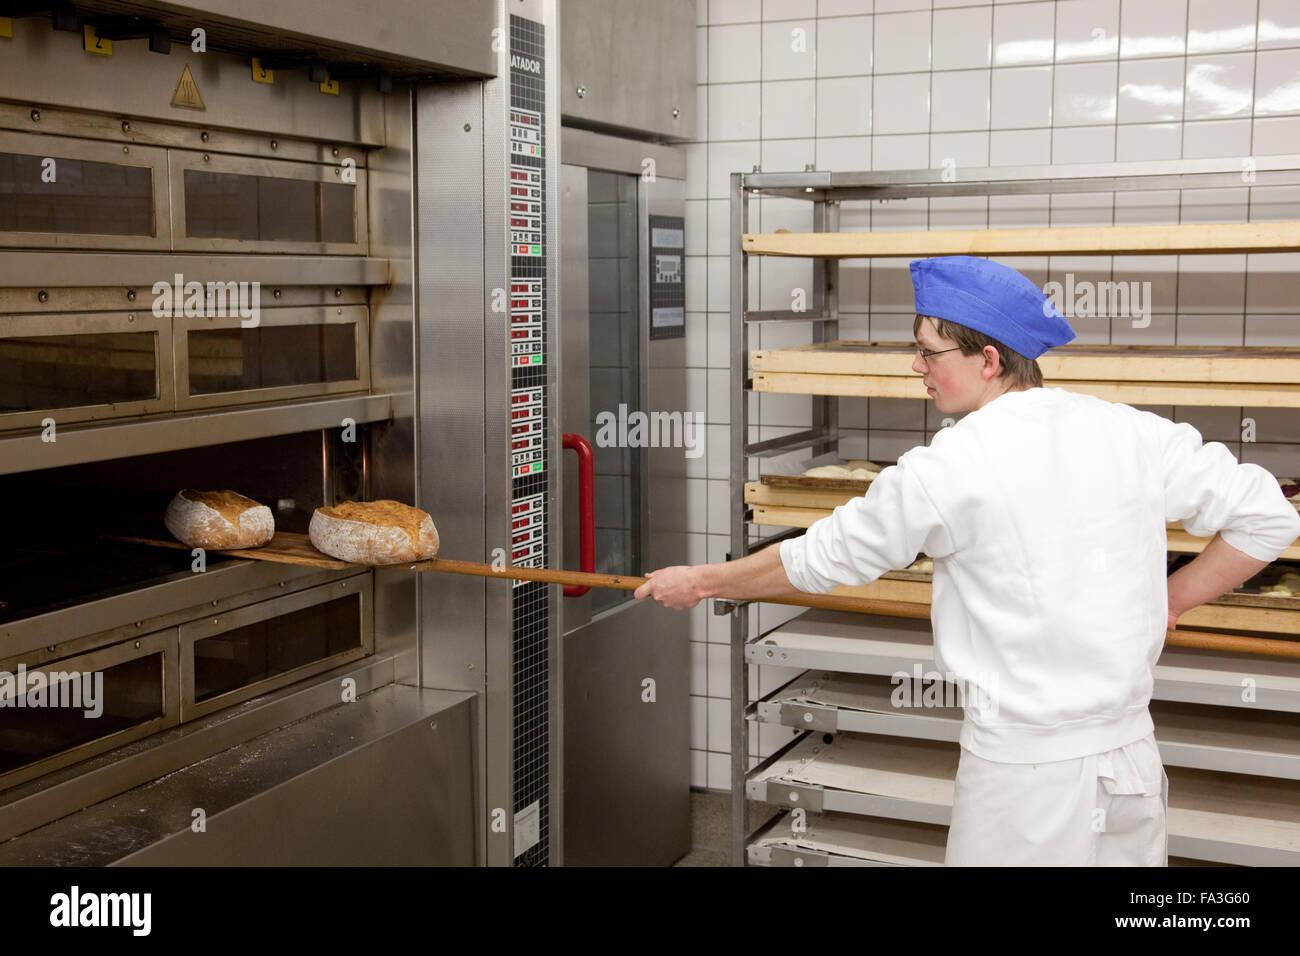 Baker apprentice baked bread. - Stock Image